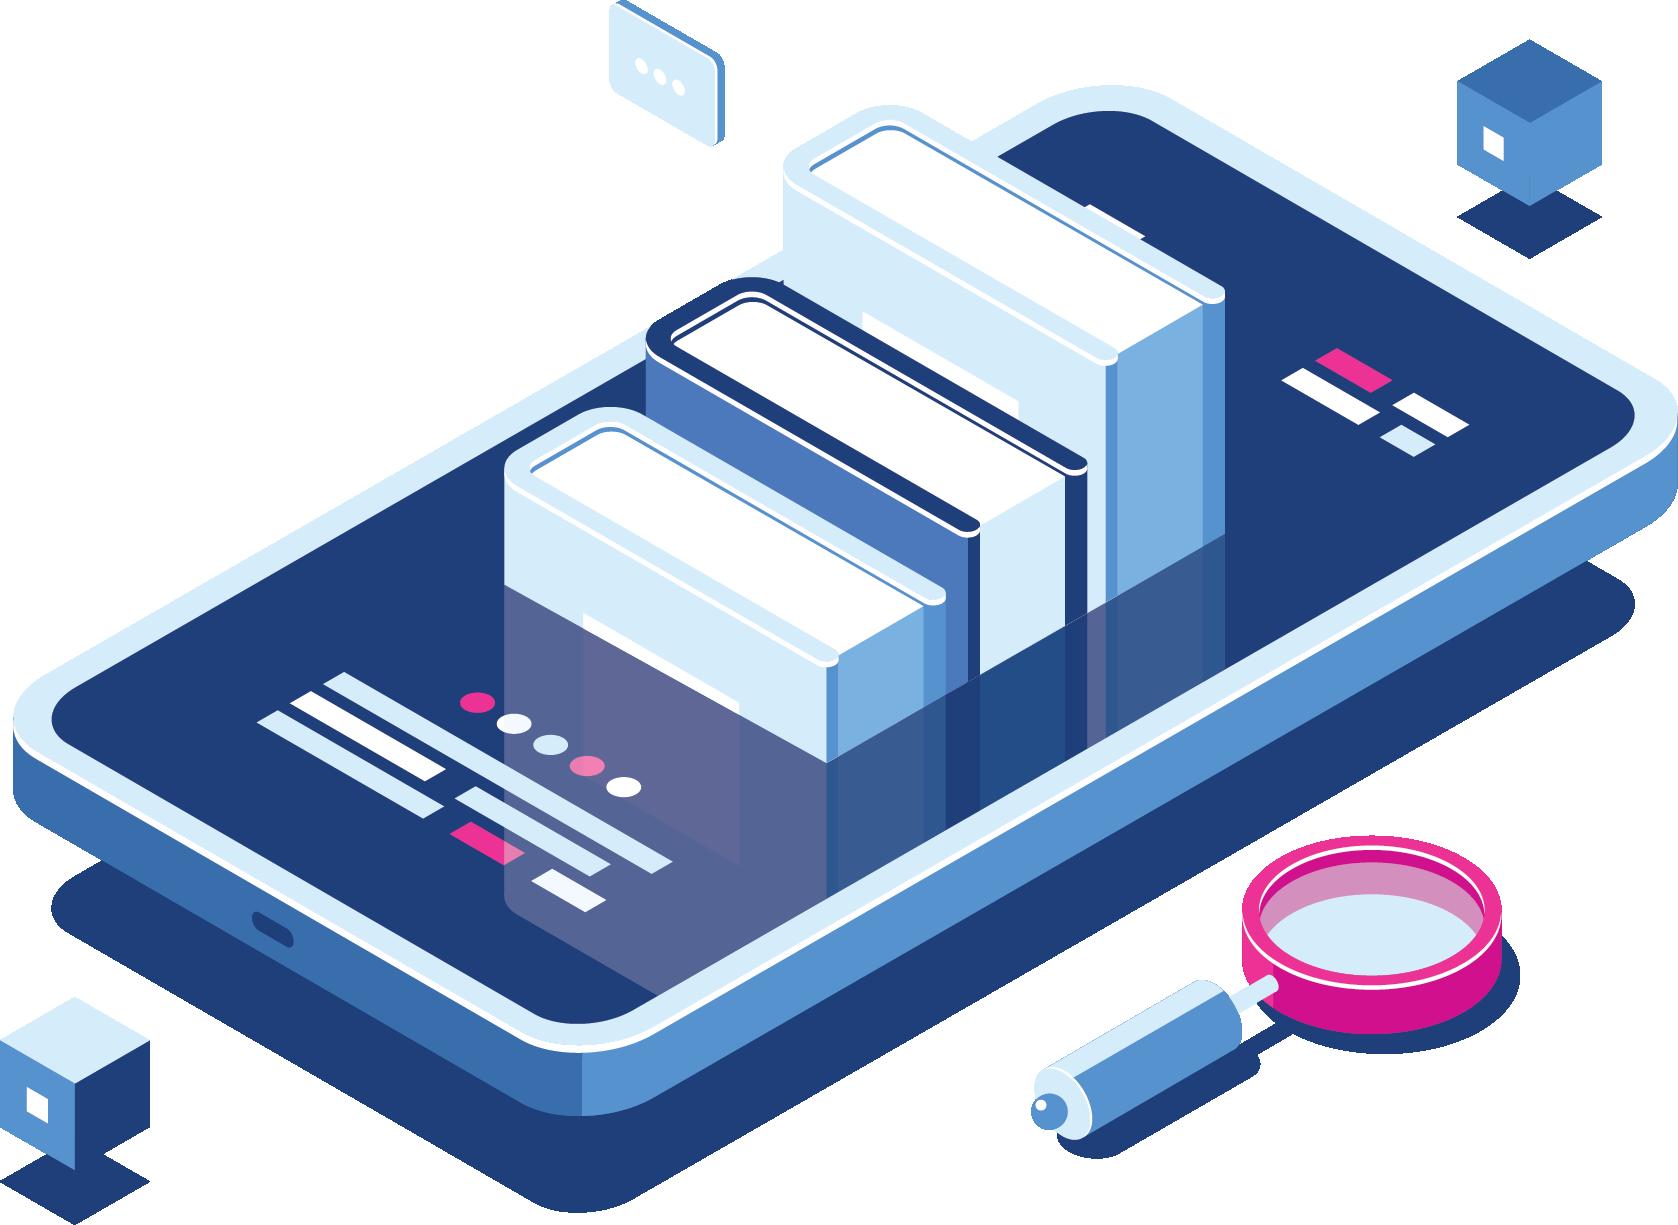 https://whiz-cloud.com/wp-content/uploads/2021/06/mobile2.png